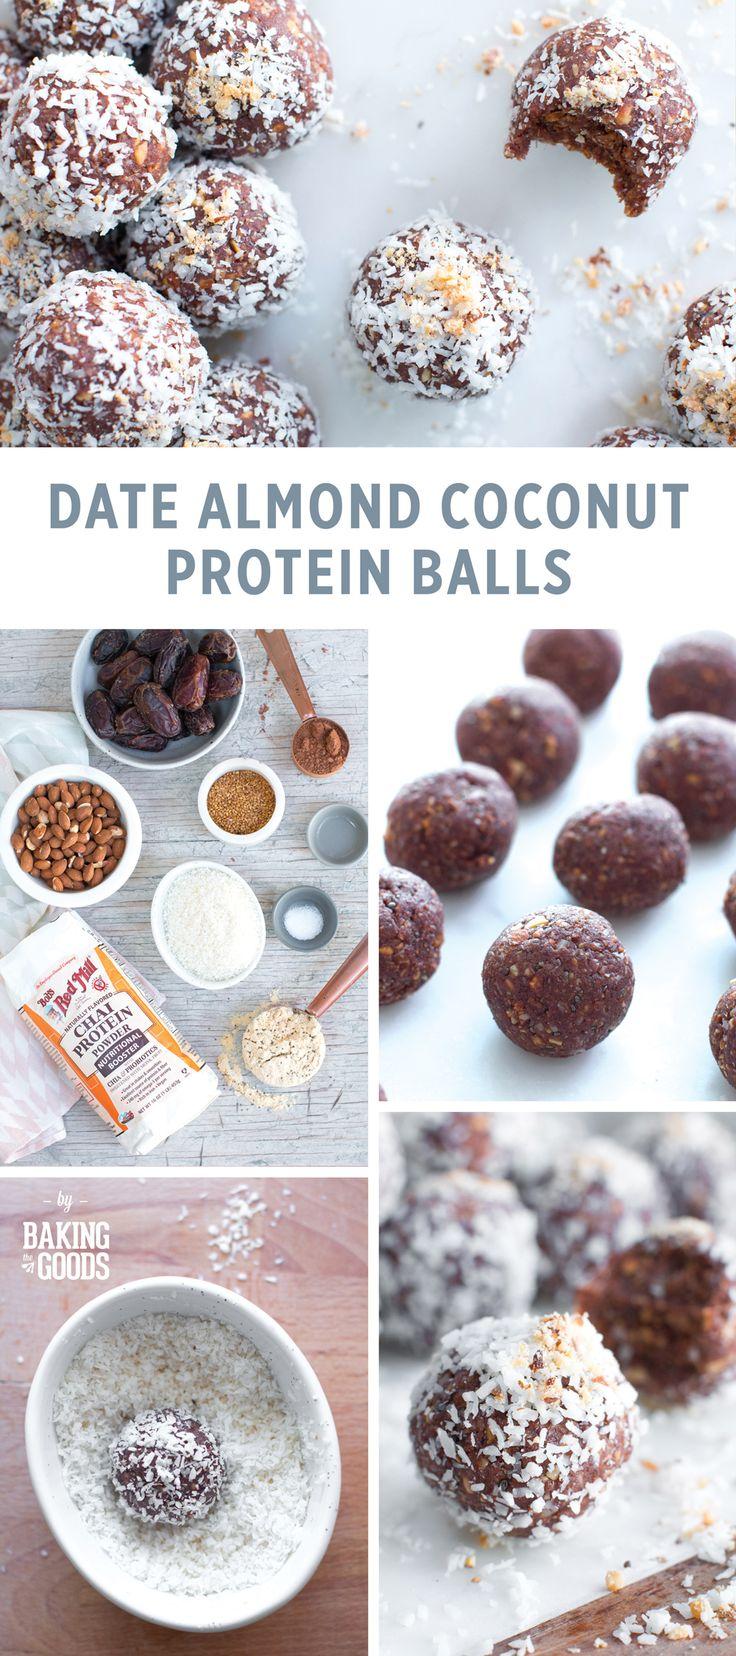 Date Almond Coconut Protein Balls